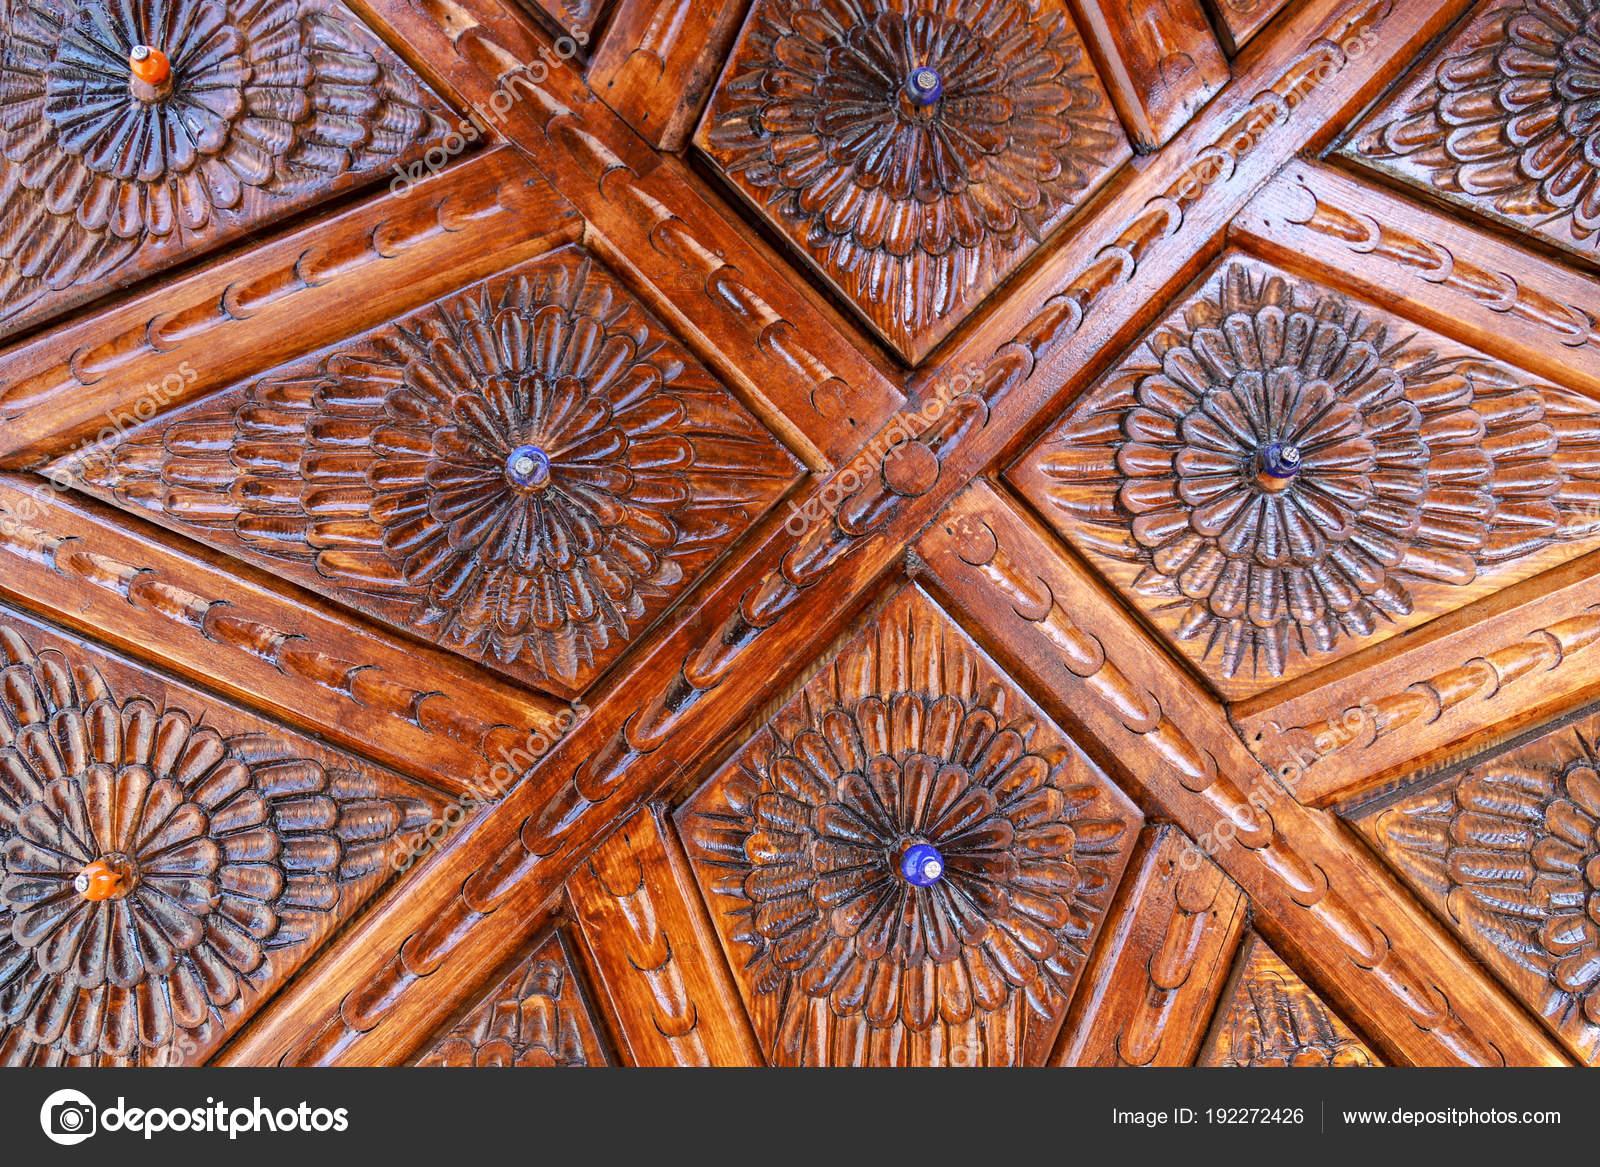 Wood carving patterns u2014 stock photo © omeryontar #192272426